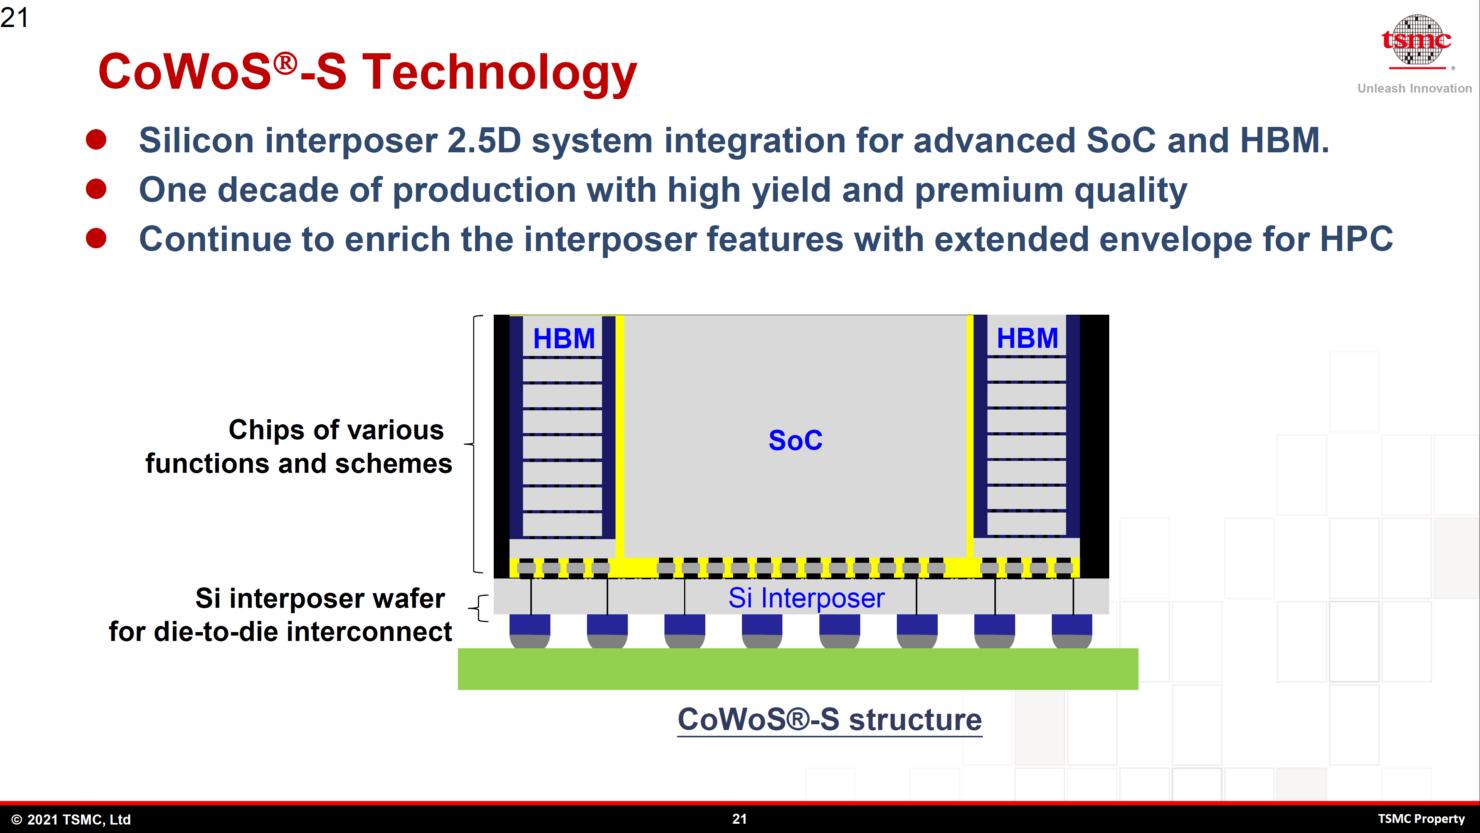 tsmc-advanced-packaging-technologies-cowos-_4